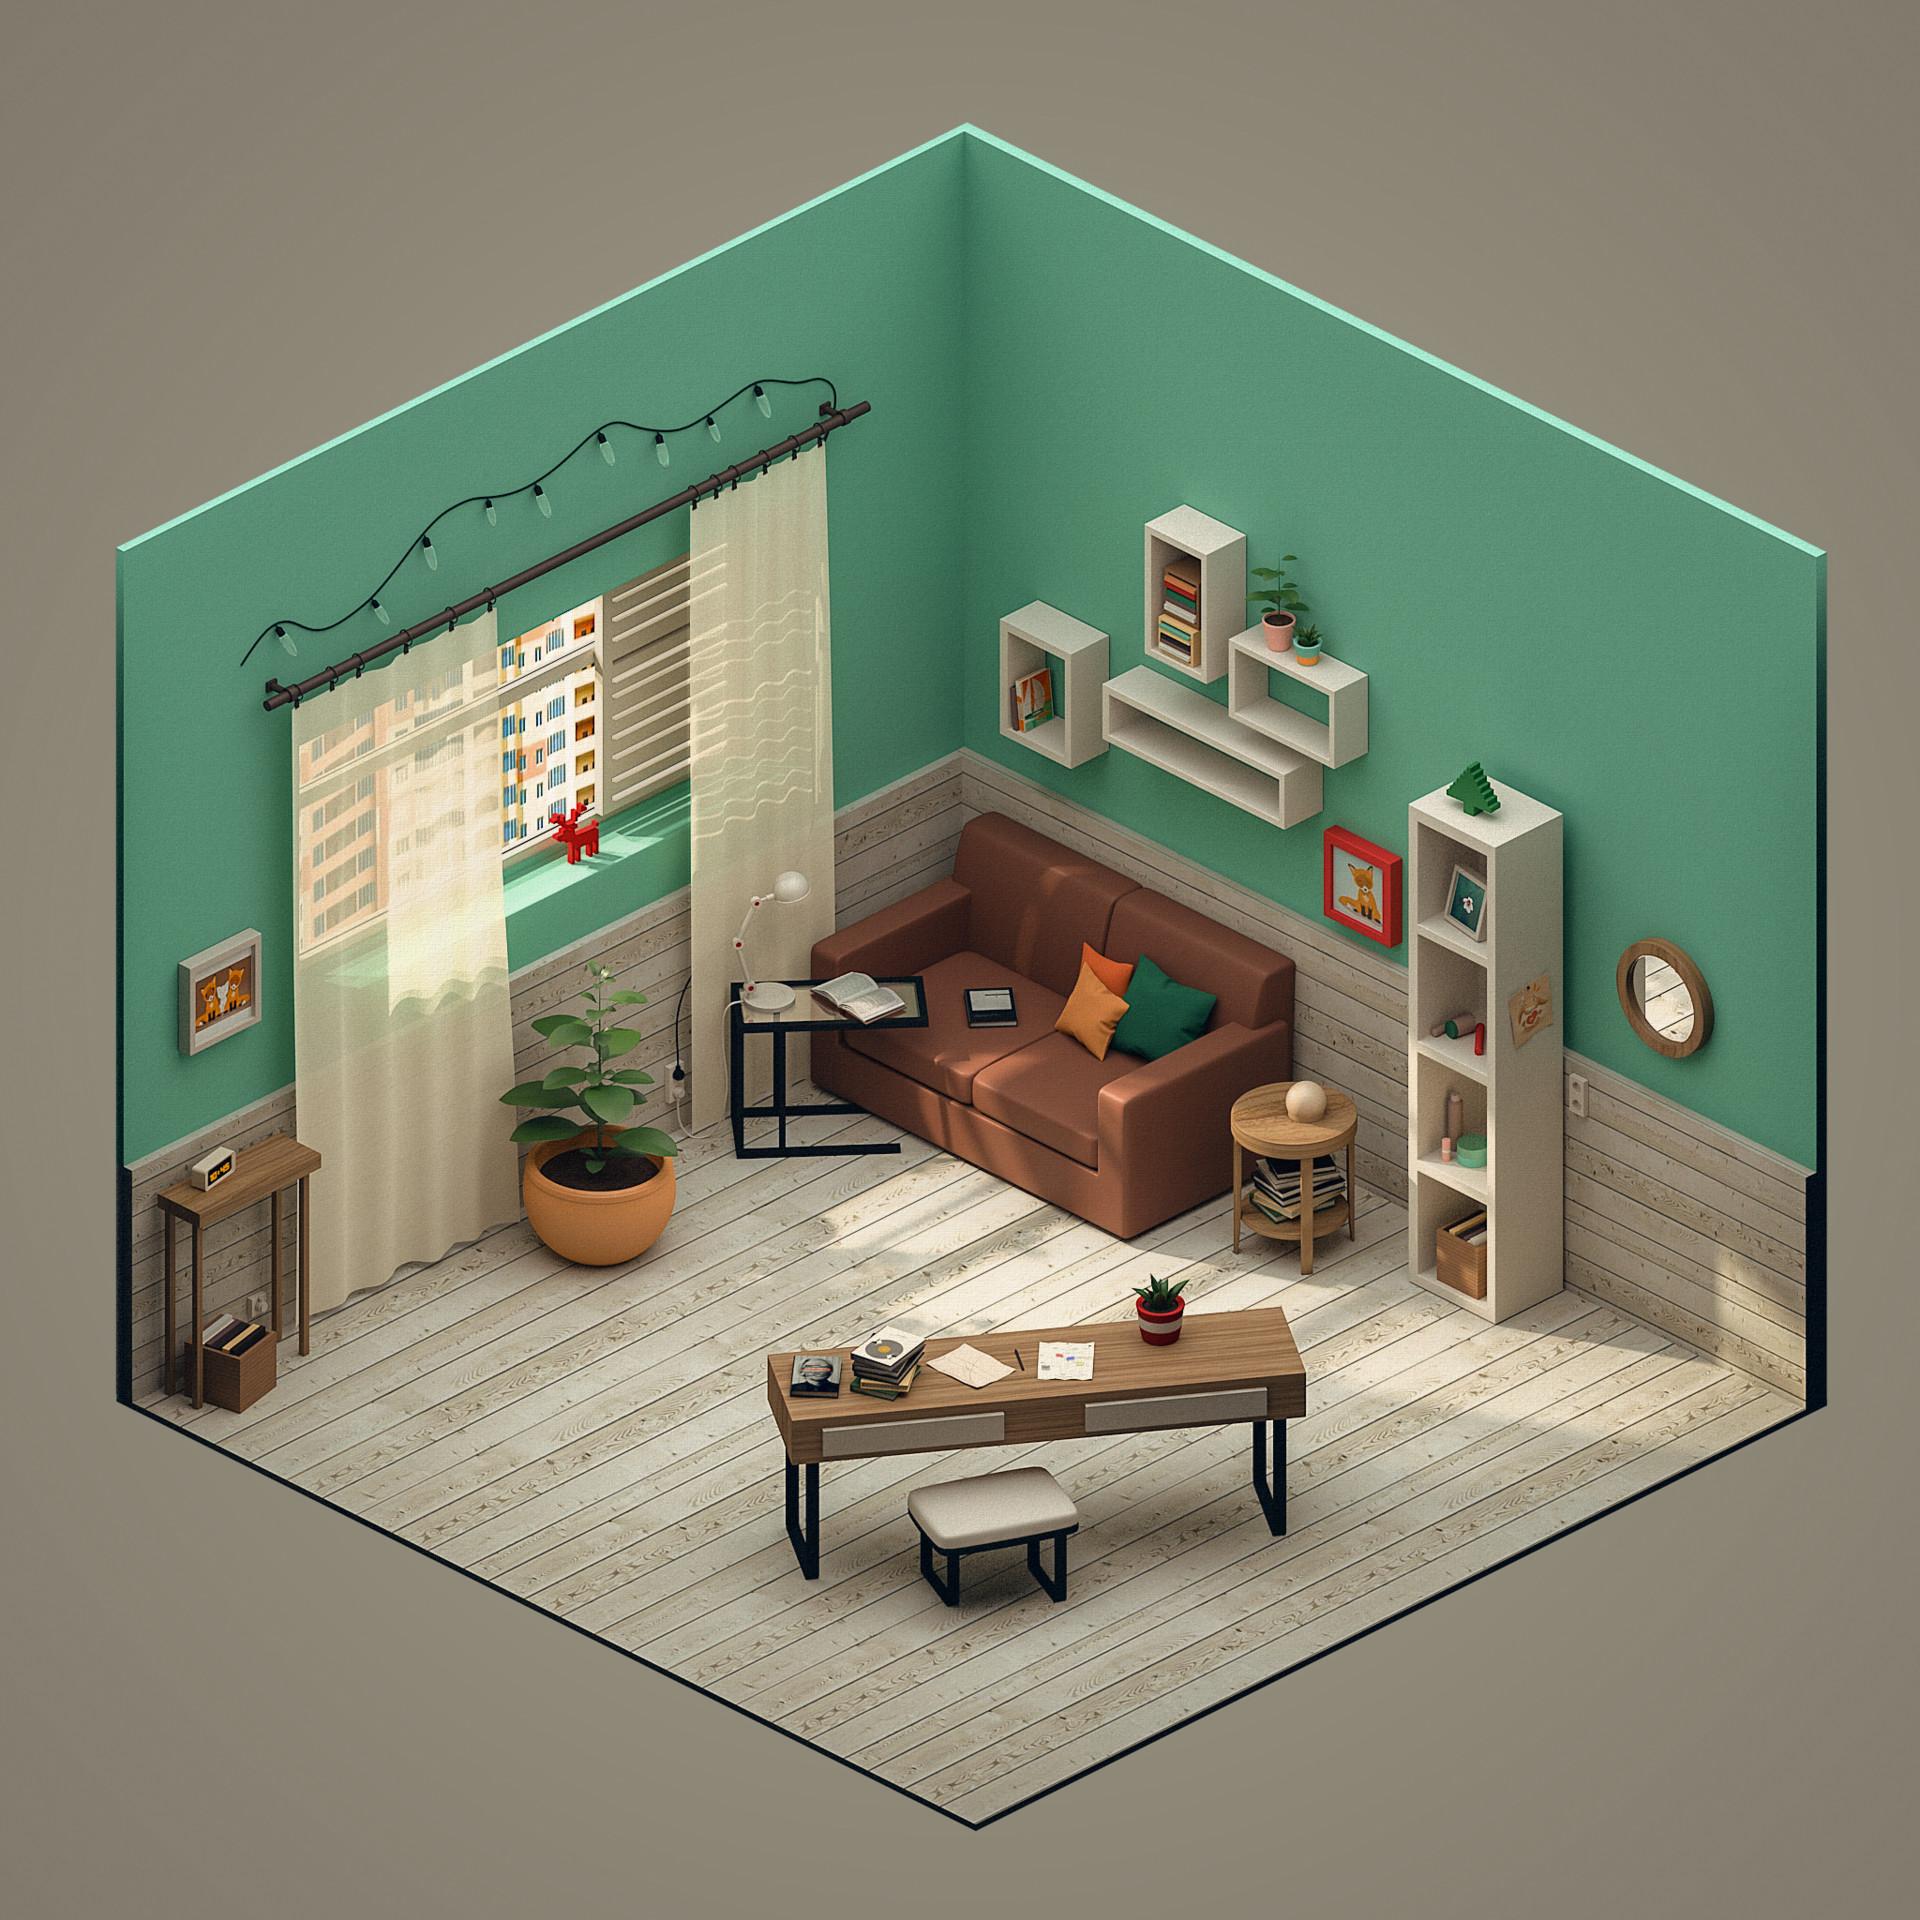 ArtStation  Isometric 3D Room Polina Leskova